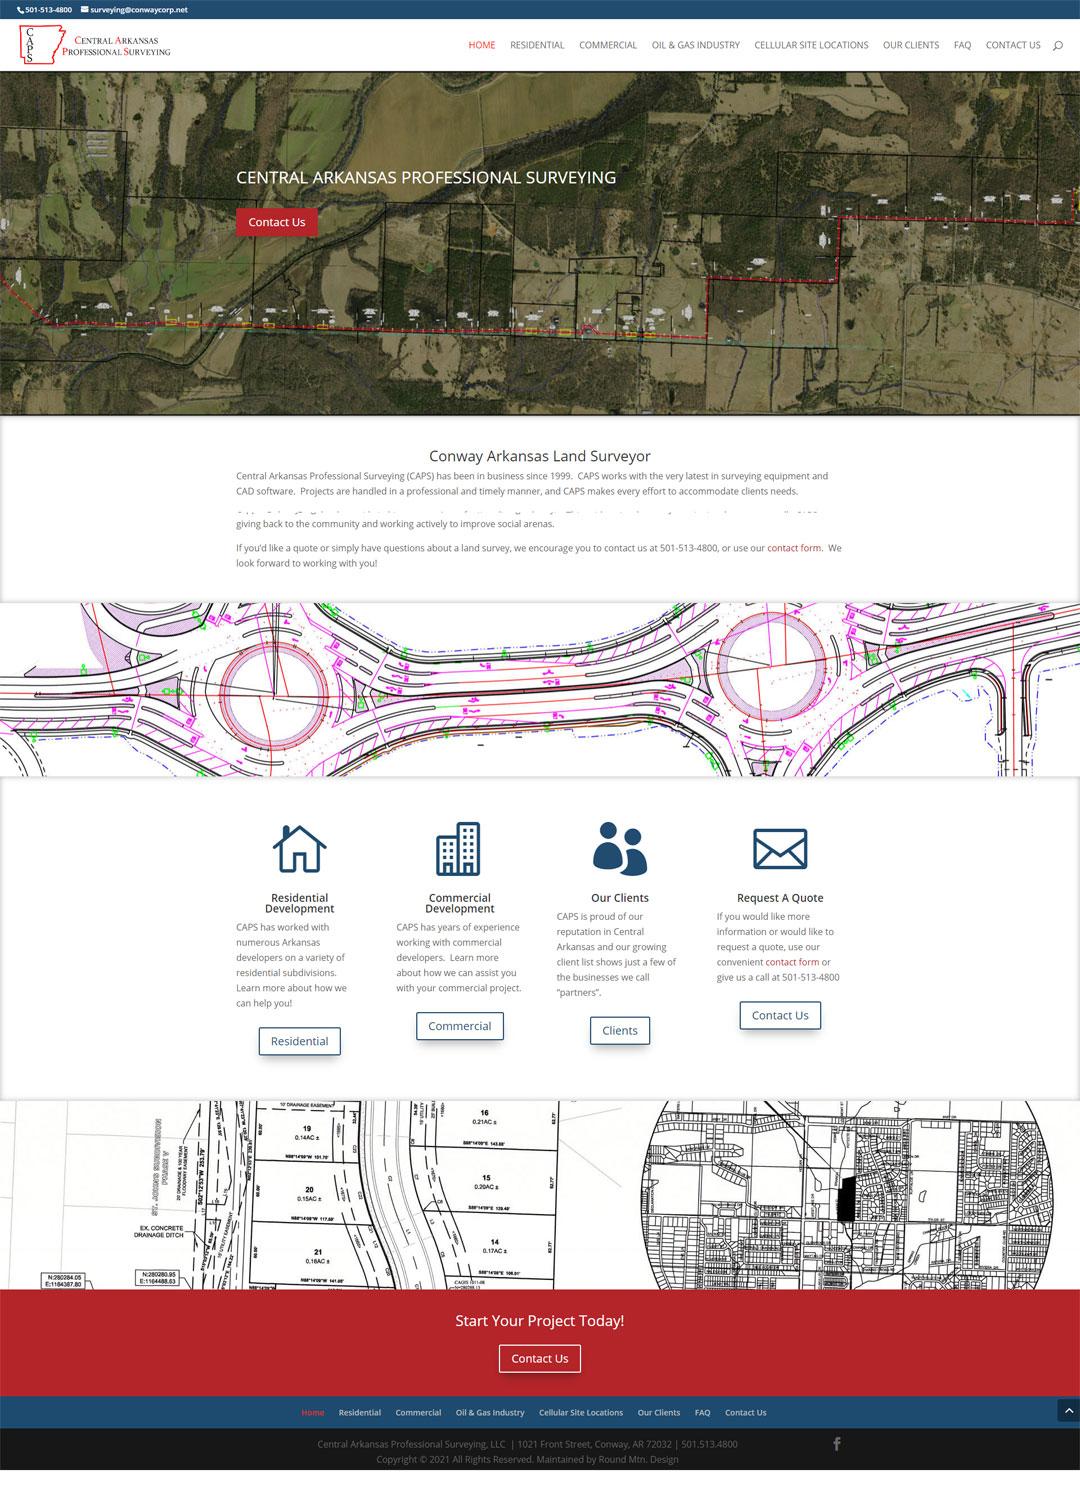 Website Design For Central Arkansas Professional Surveying